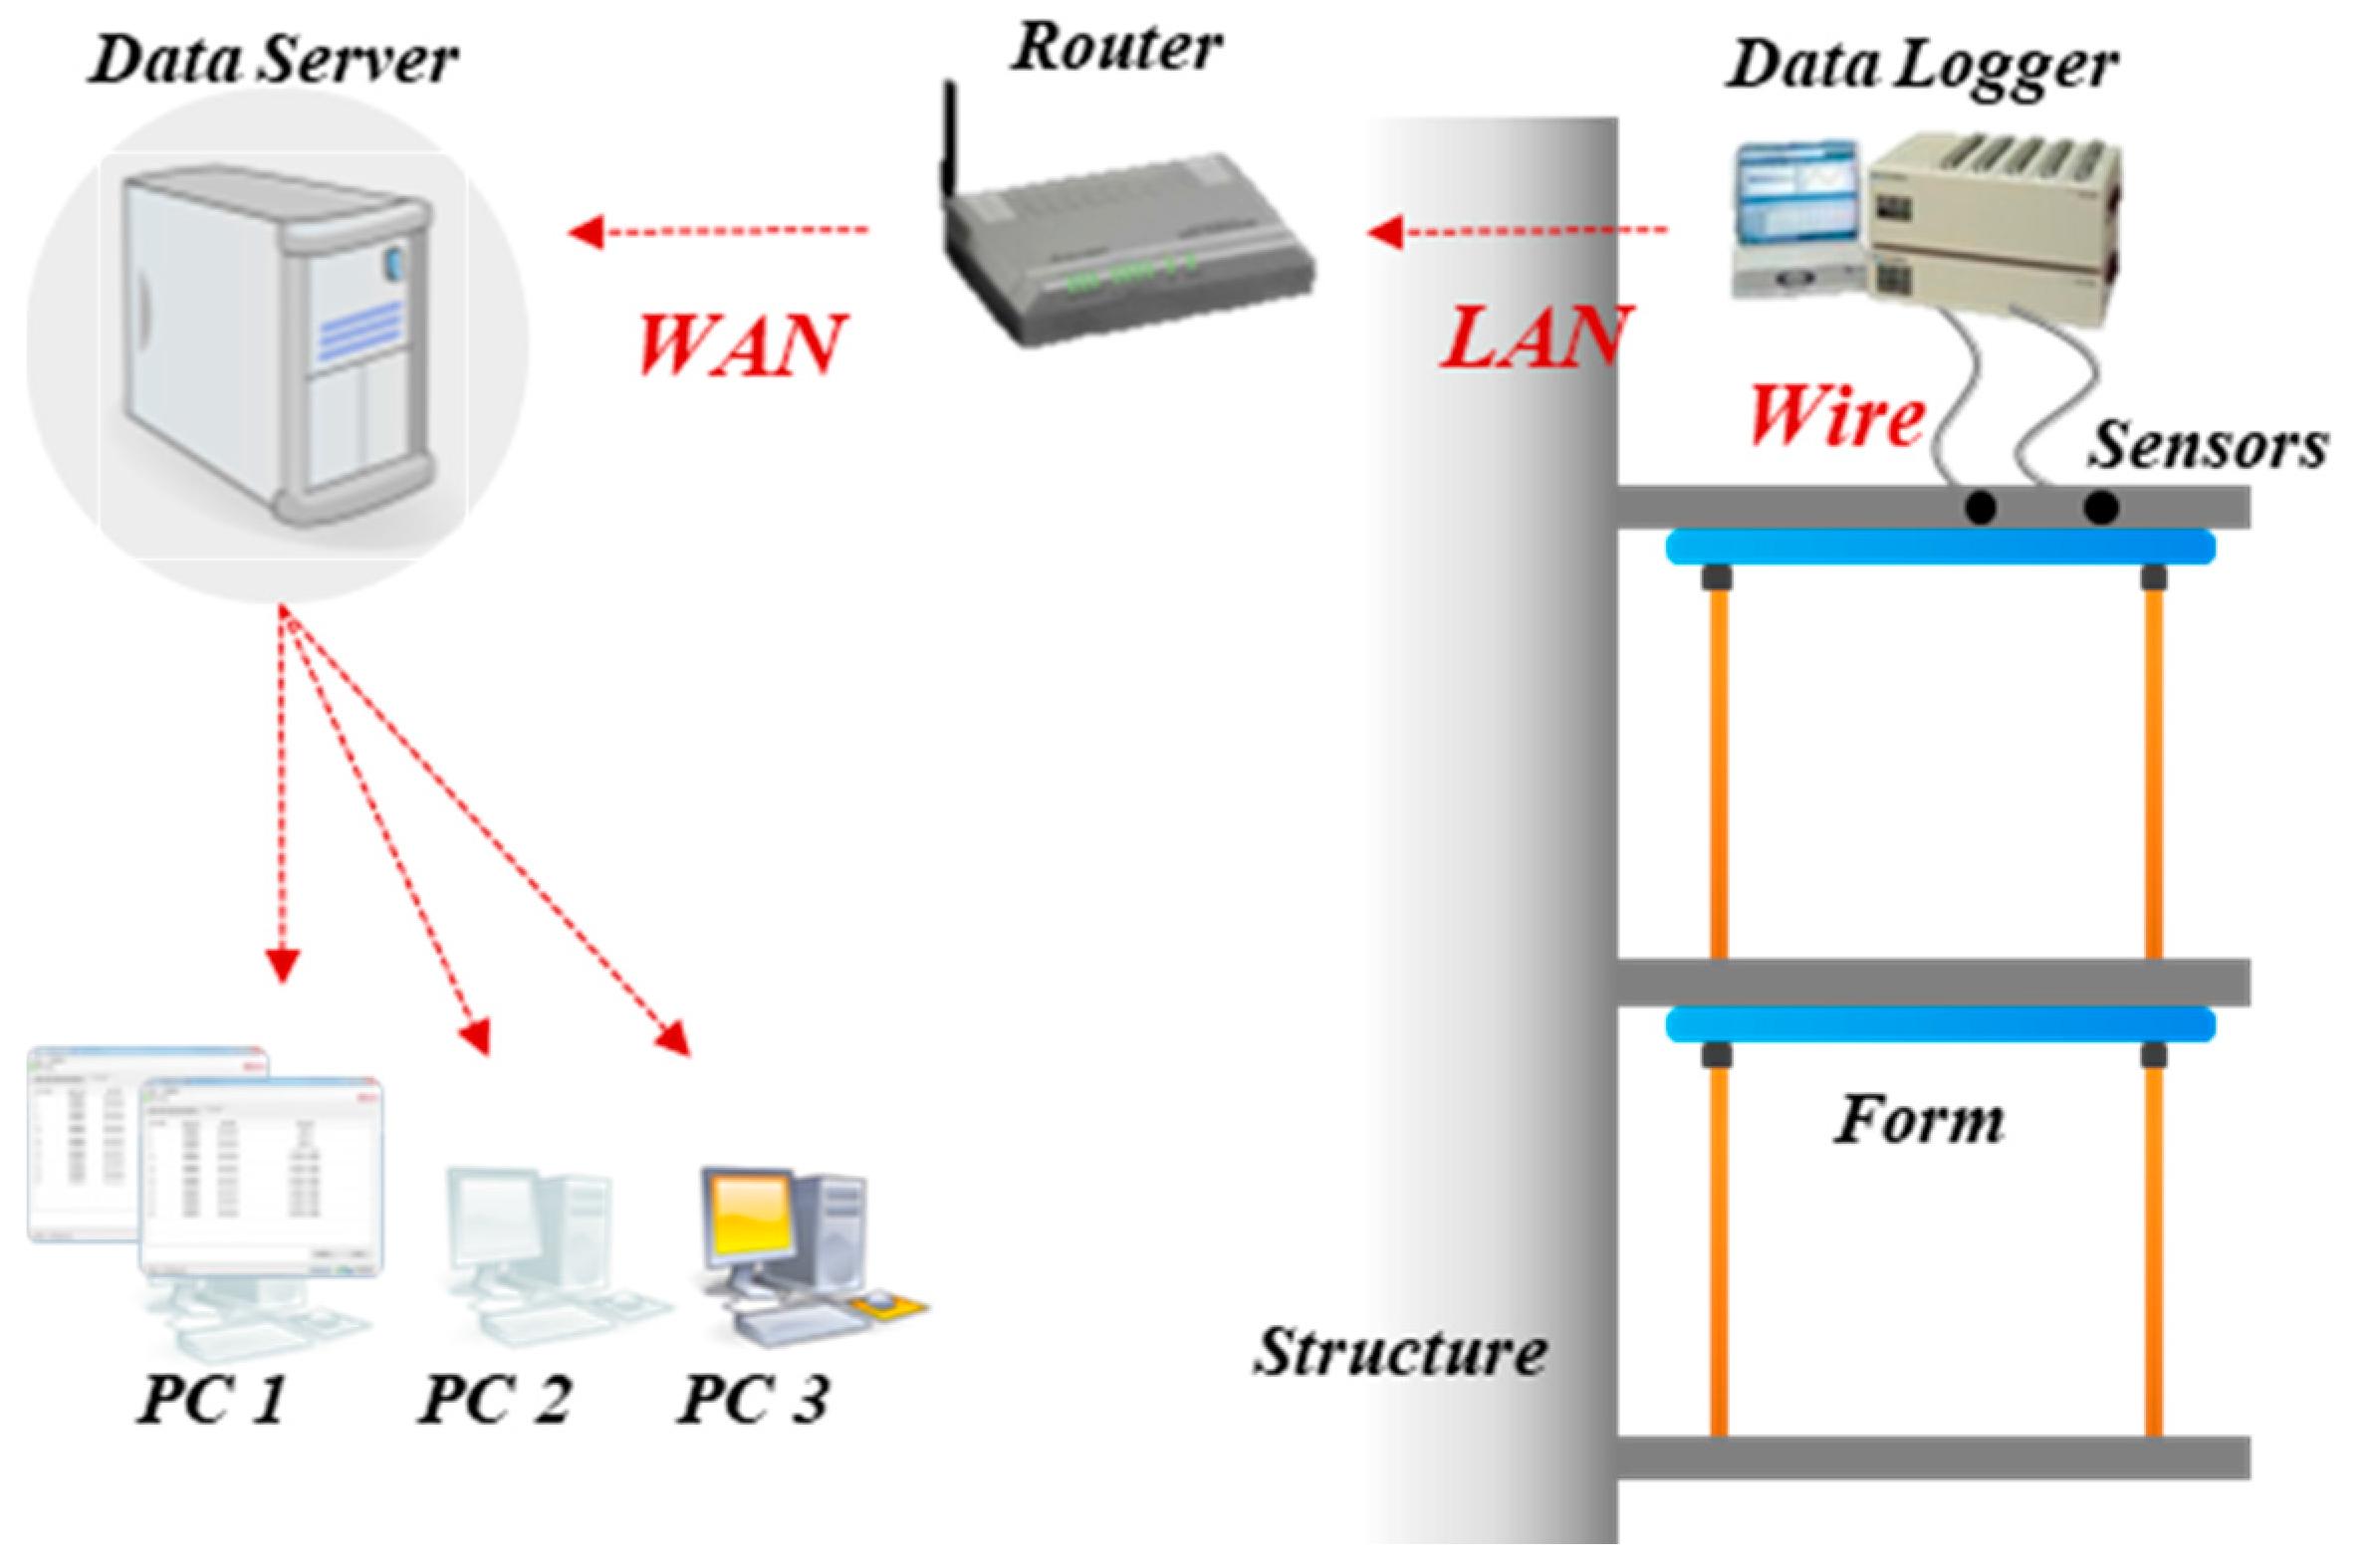 sustainability 09 01360 g003 mh 103 qm wiring diagram gandul 45 77 79 119 uc9050t wiring diagram at mifinder.co